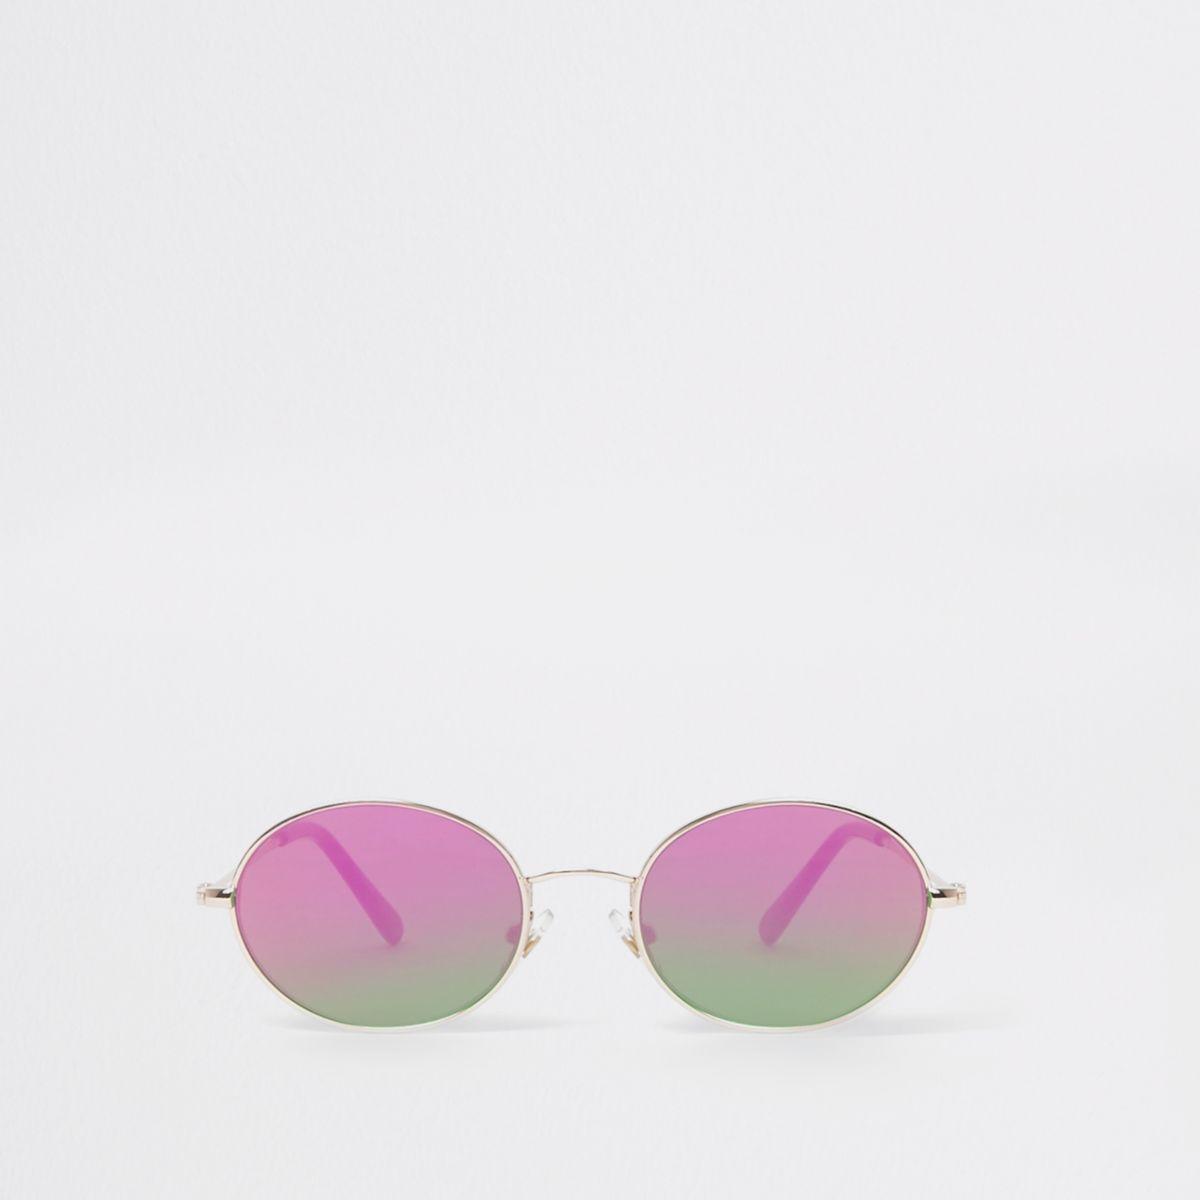 Boys gold tone oval fire lens sunglasses